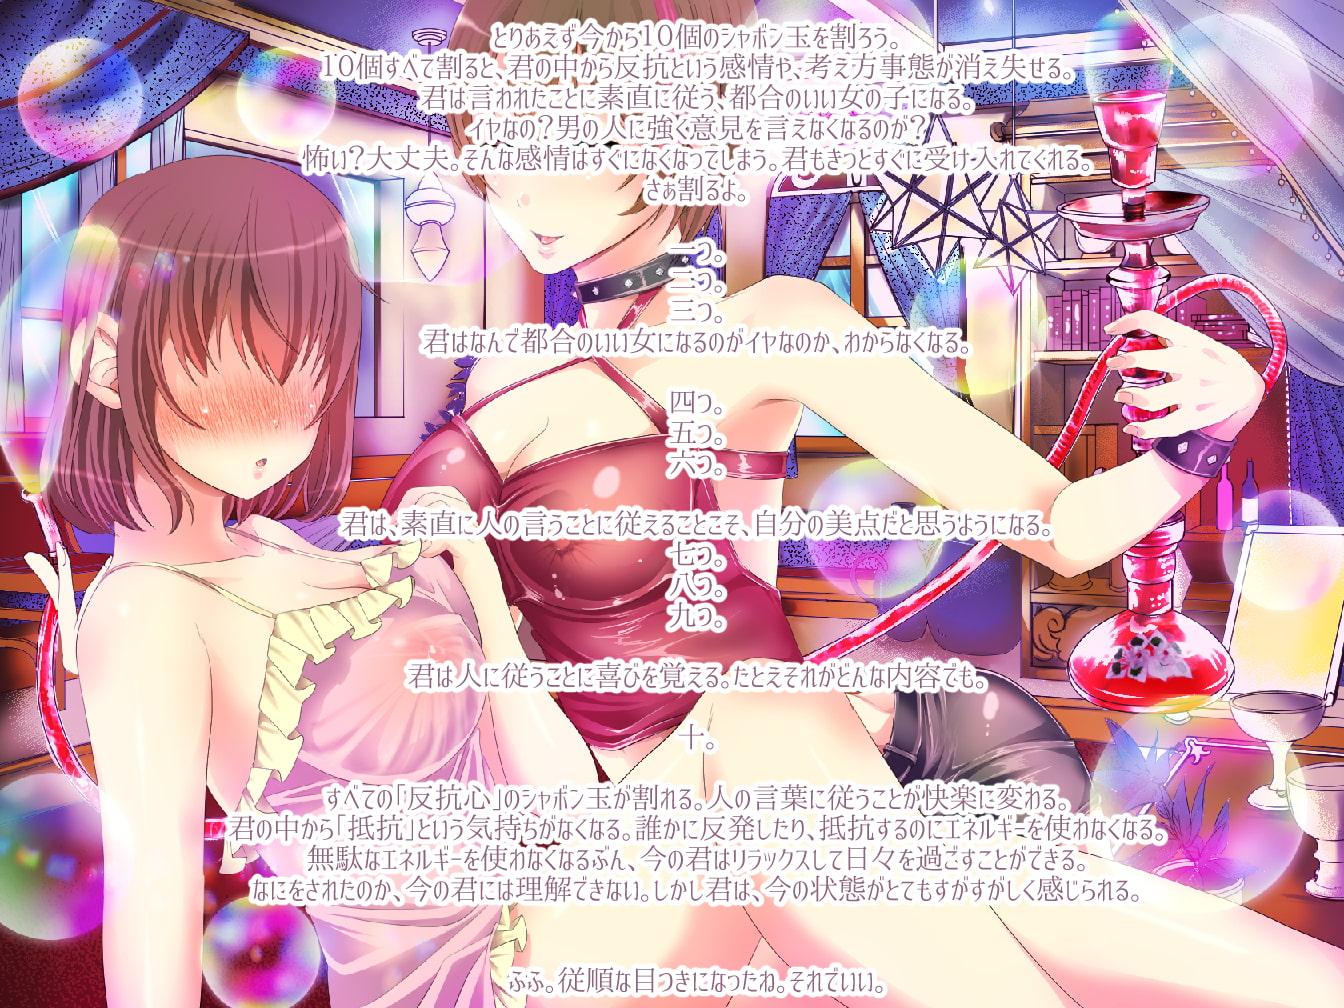 【TS調教】不思議な催眠商店~イカされるたびに男ではなくなっていくアナタ~